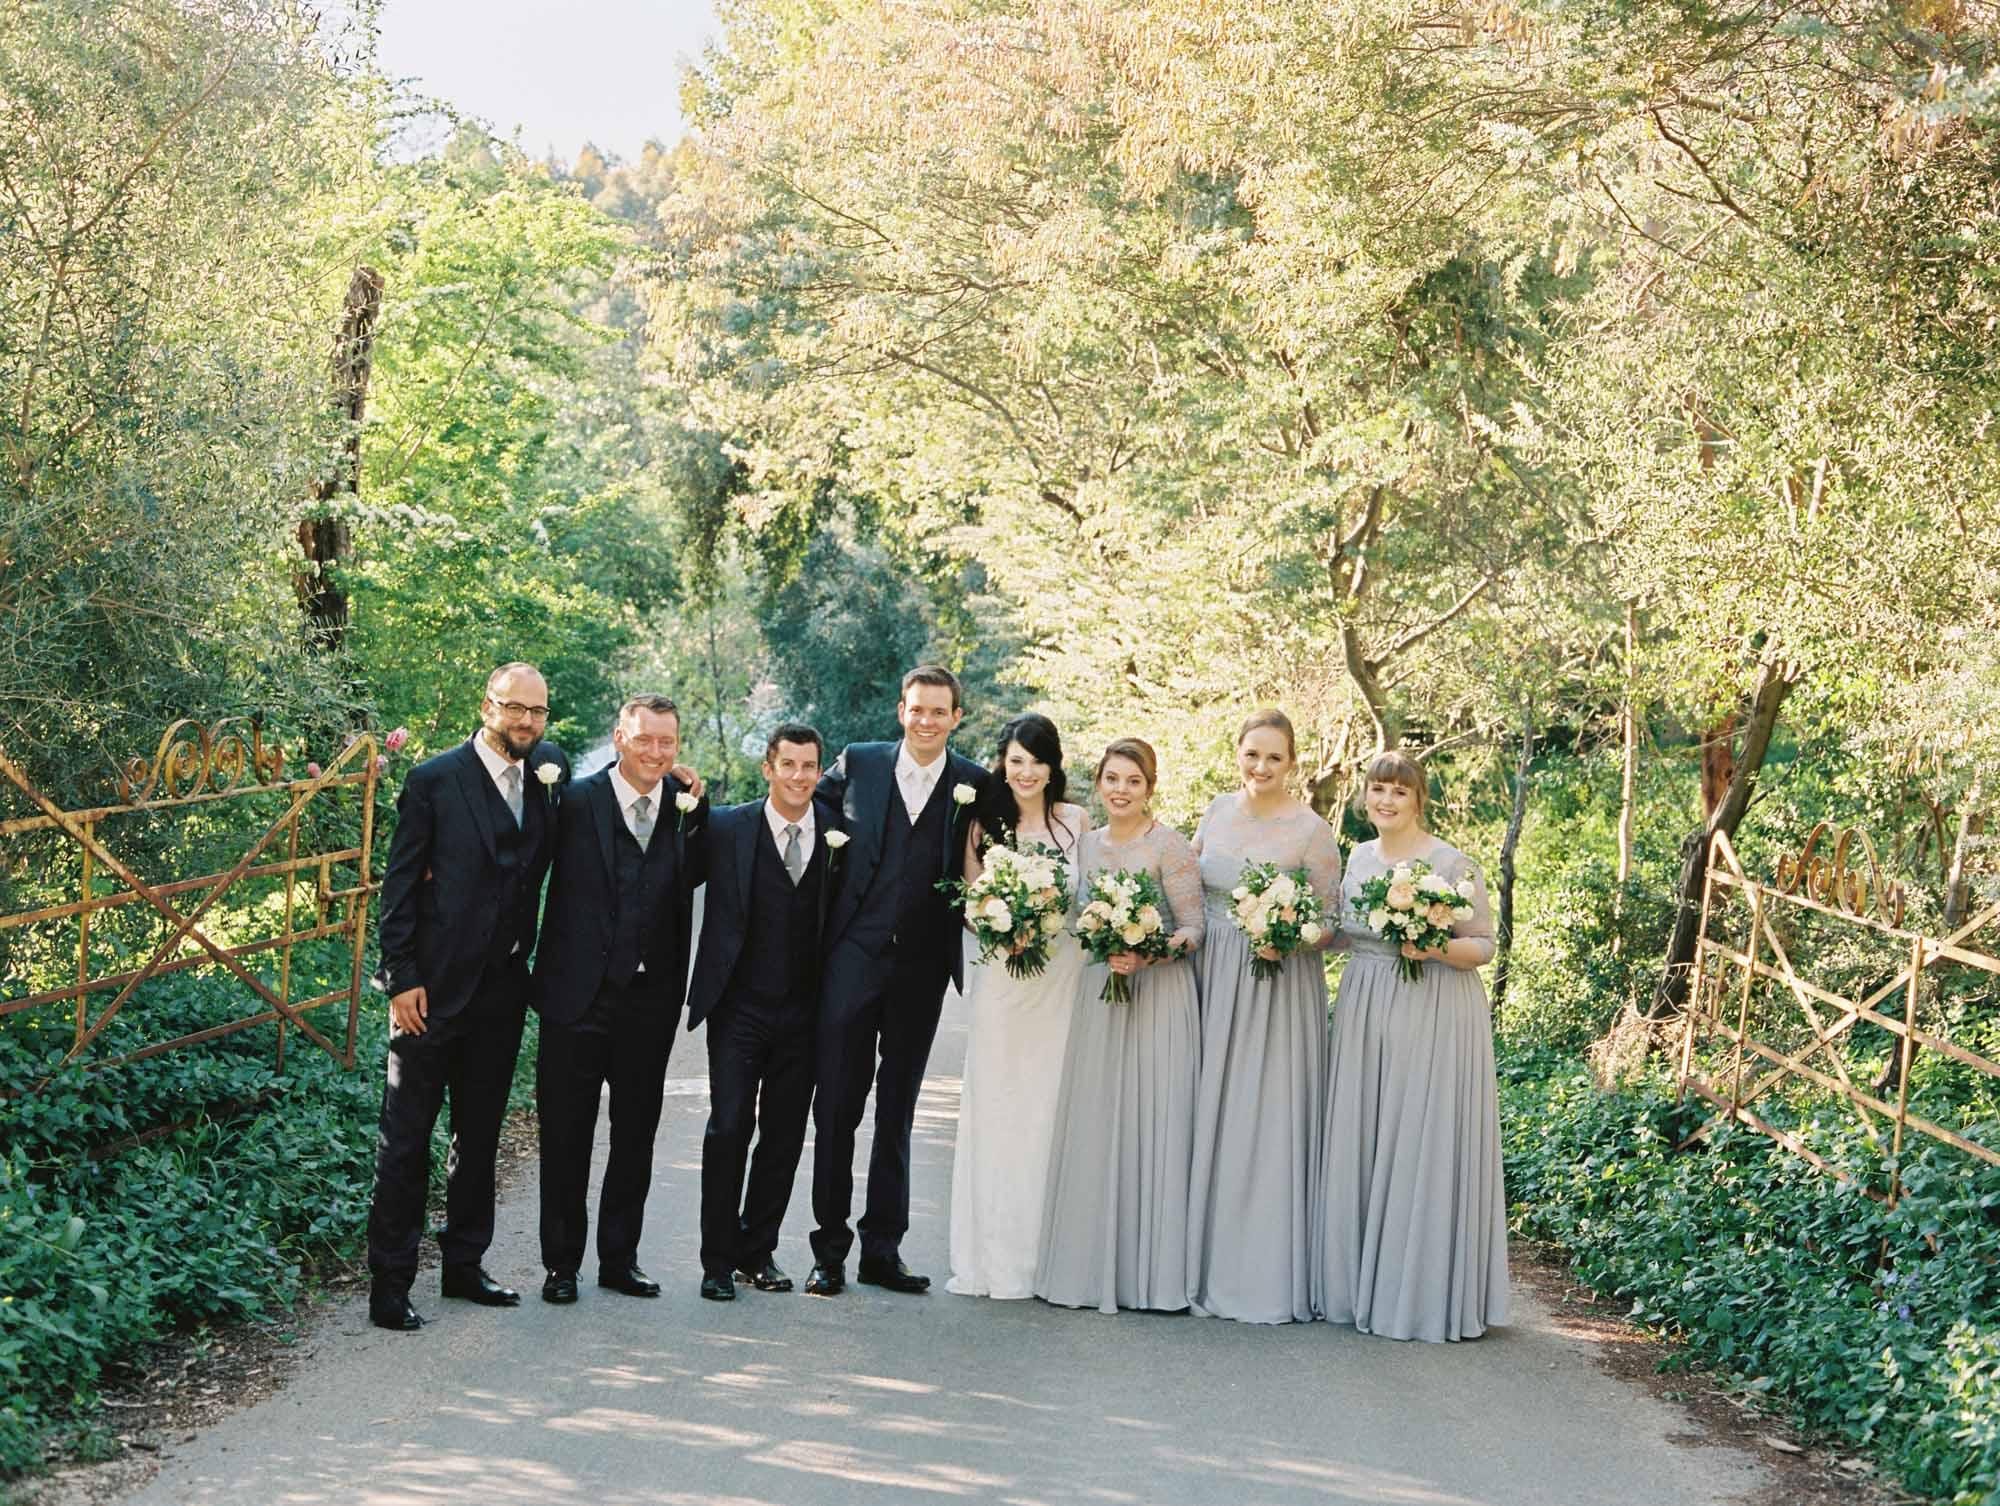 Glen-Ewin-Estate-wedding-photography-057.jpg